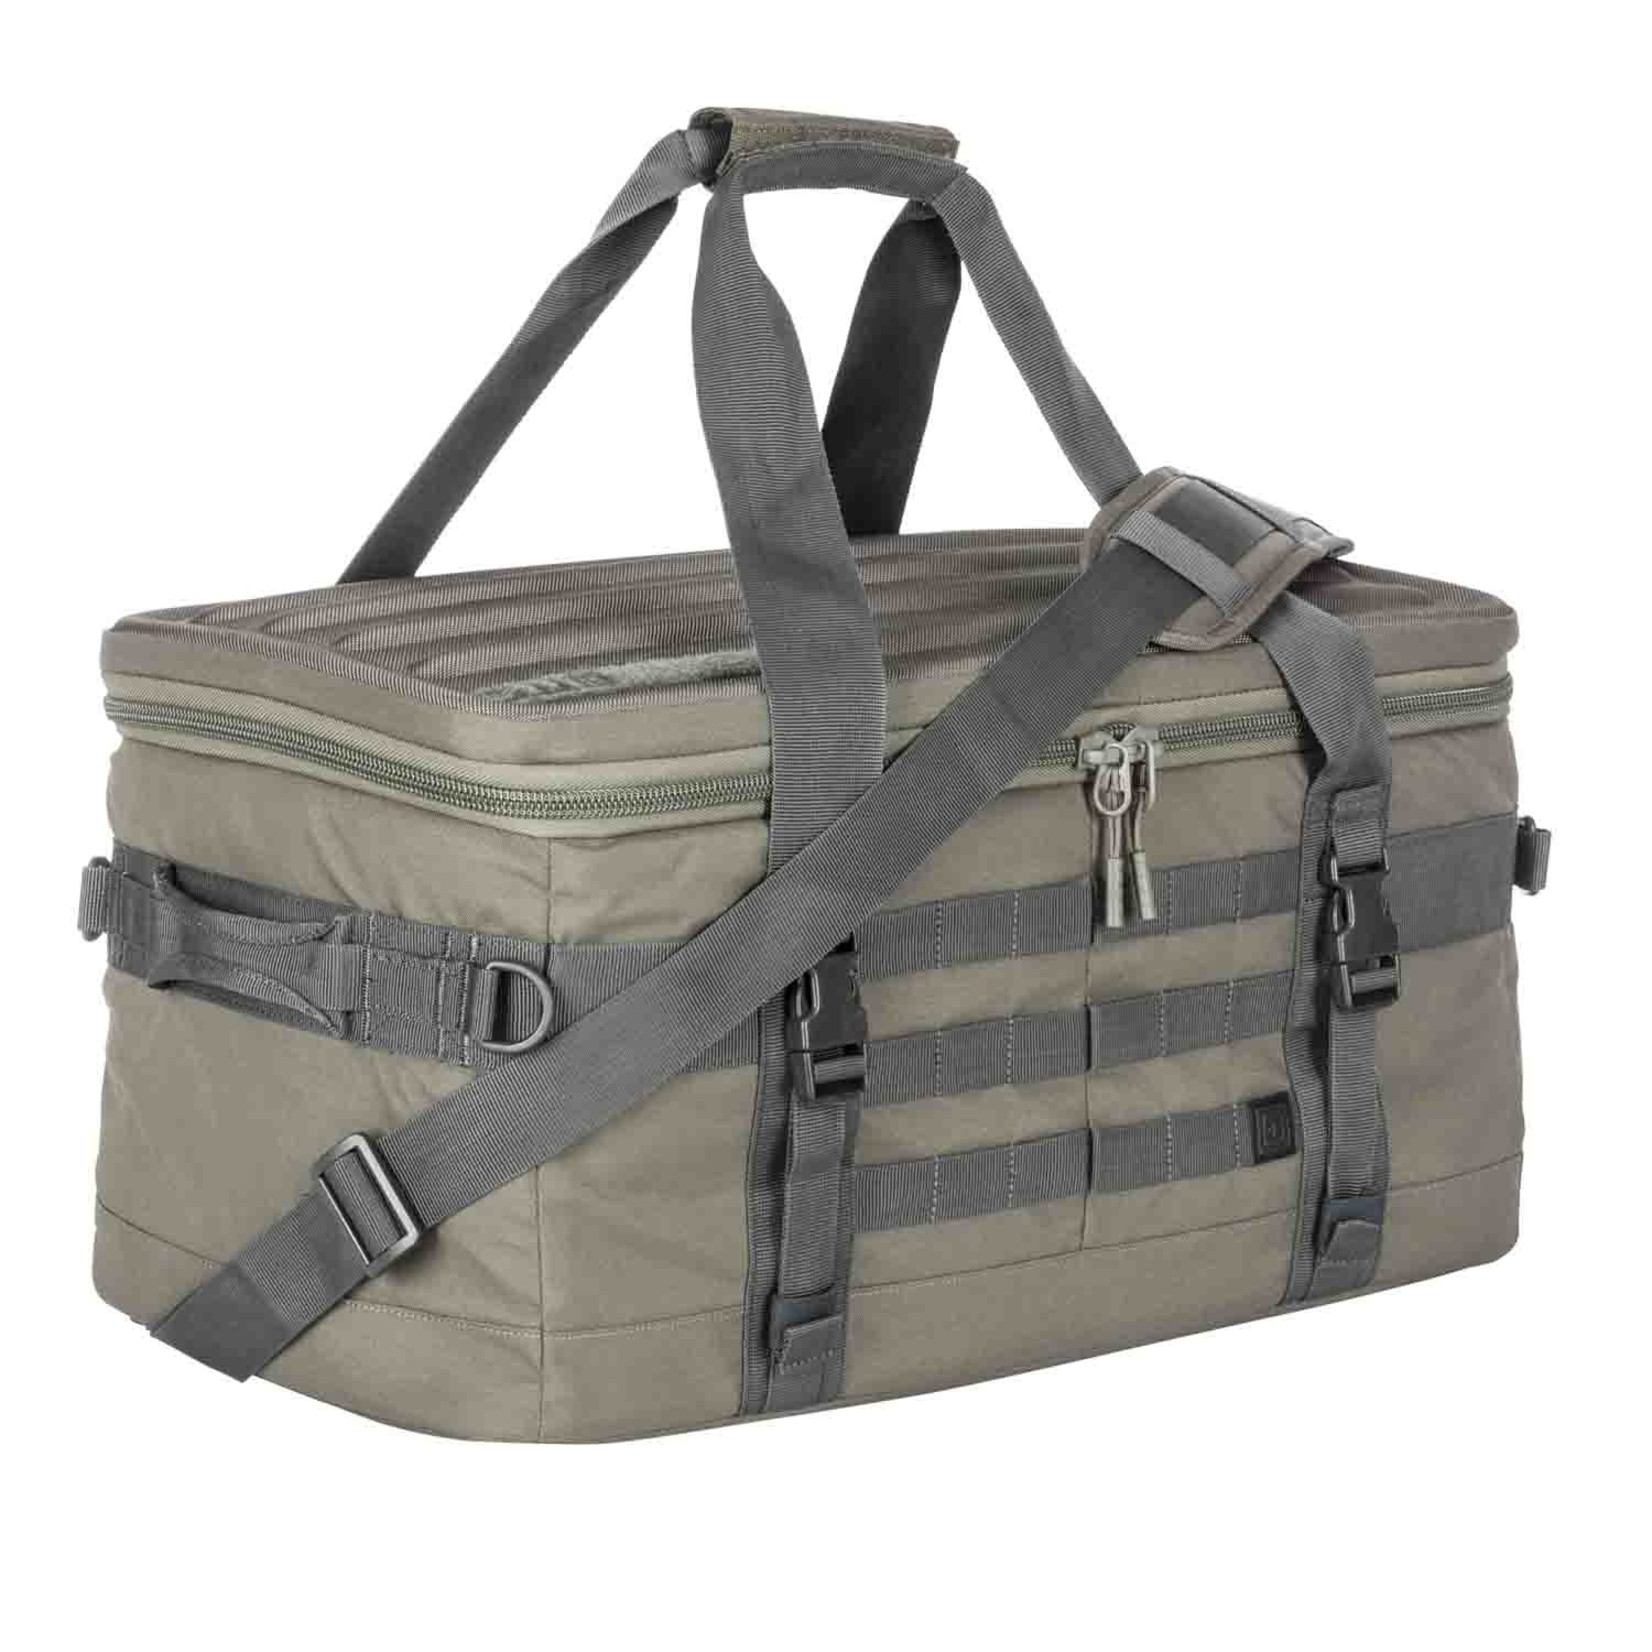 5.11 Tactical 5.11 Range Master Duffel Bag